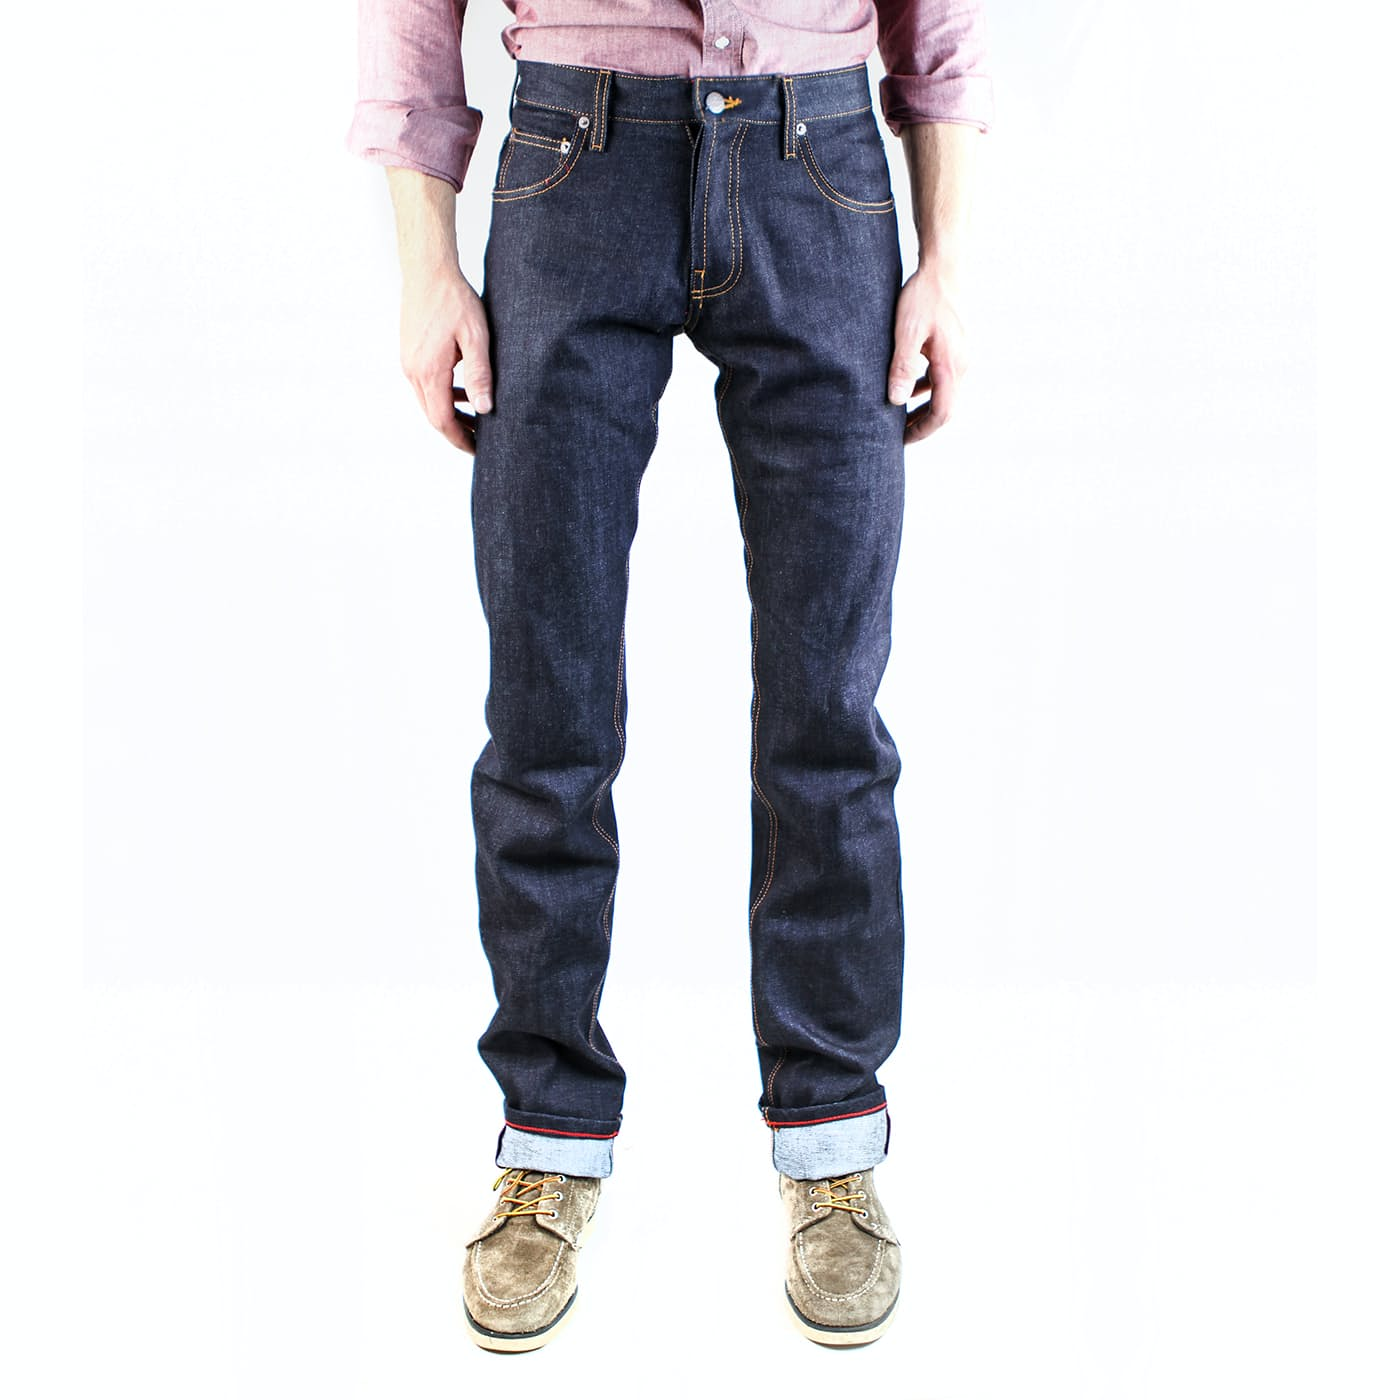 Gdgaa5dzzp taylor stitch townsend straight leg 13.5oz pants 0 original